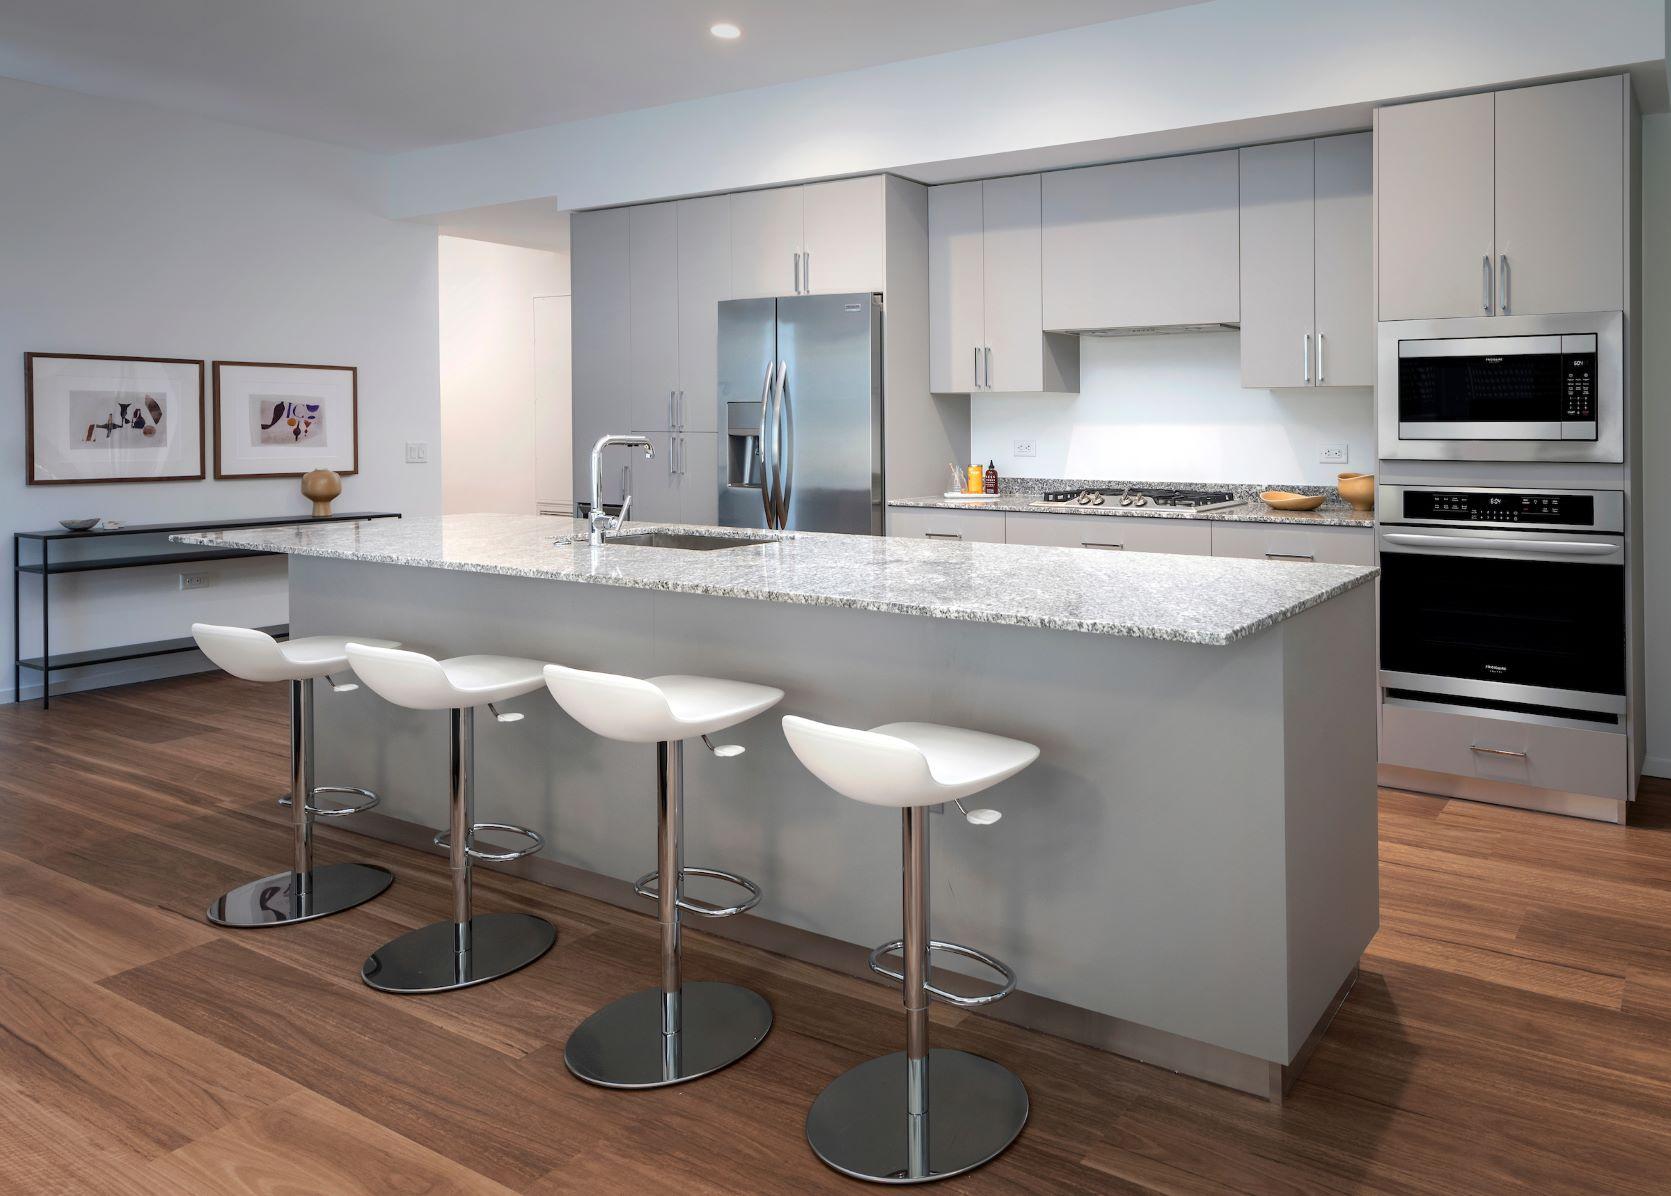 Designer kitchen finishes by Optima Kierland Apartments